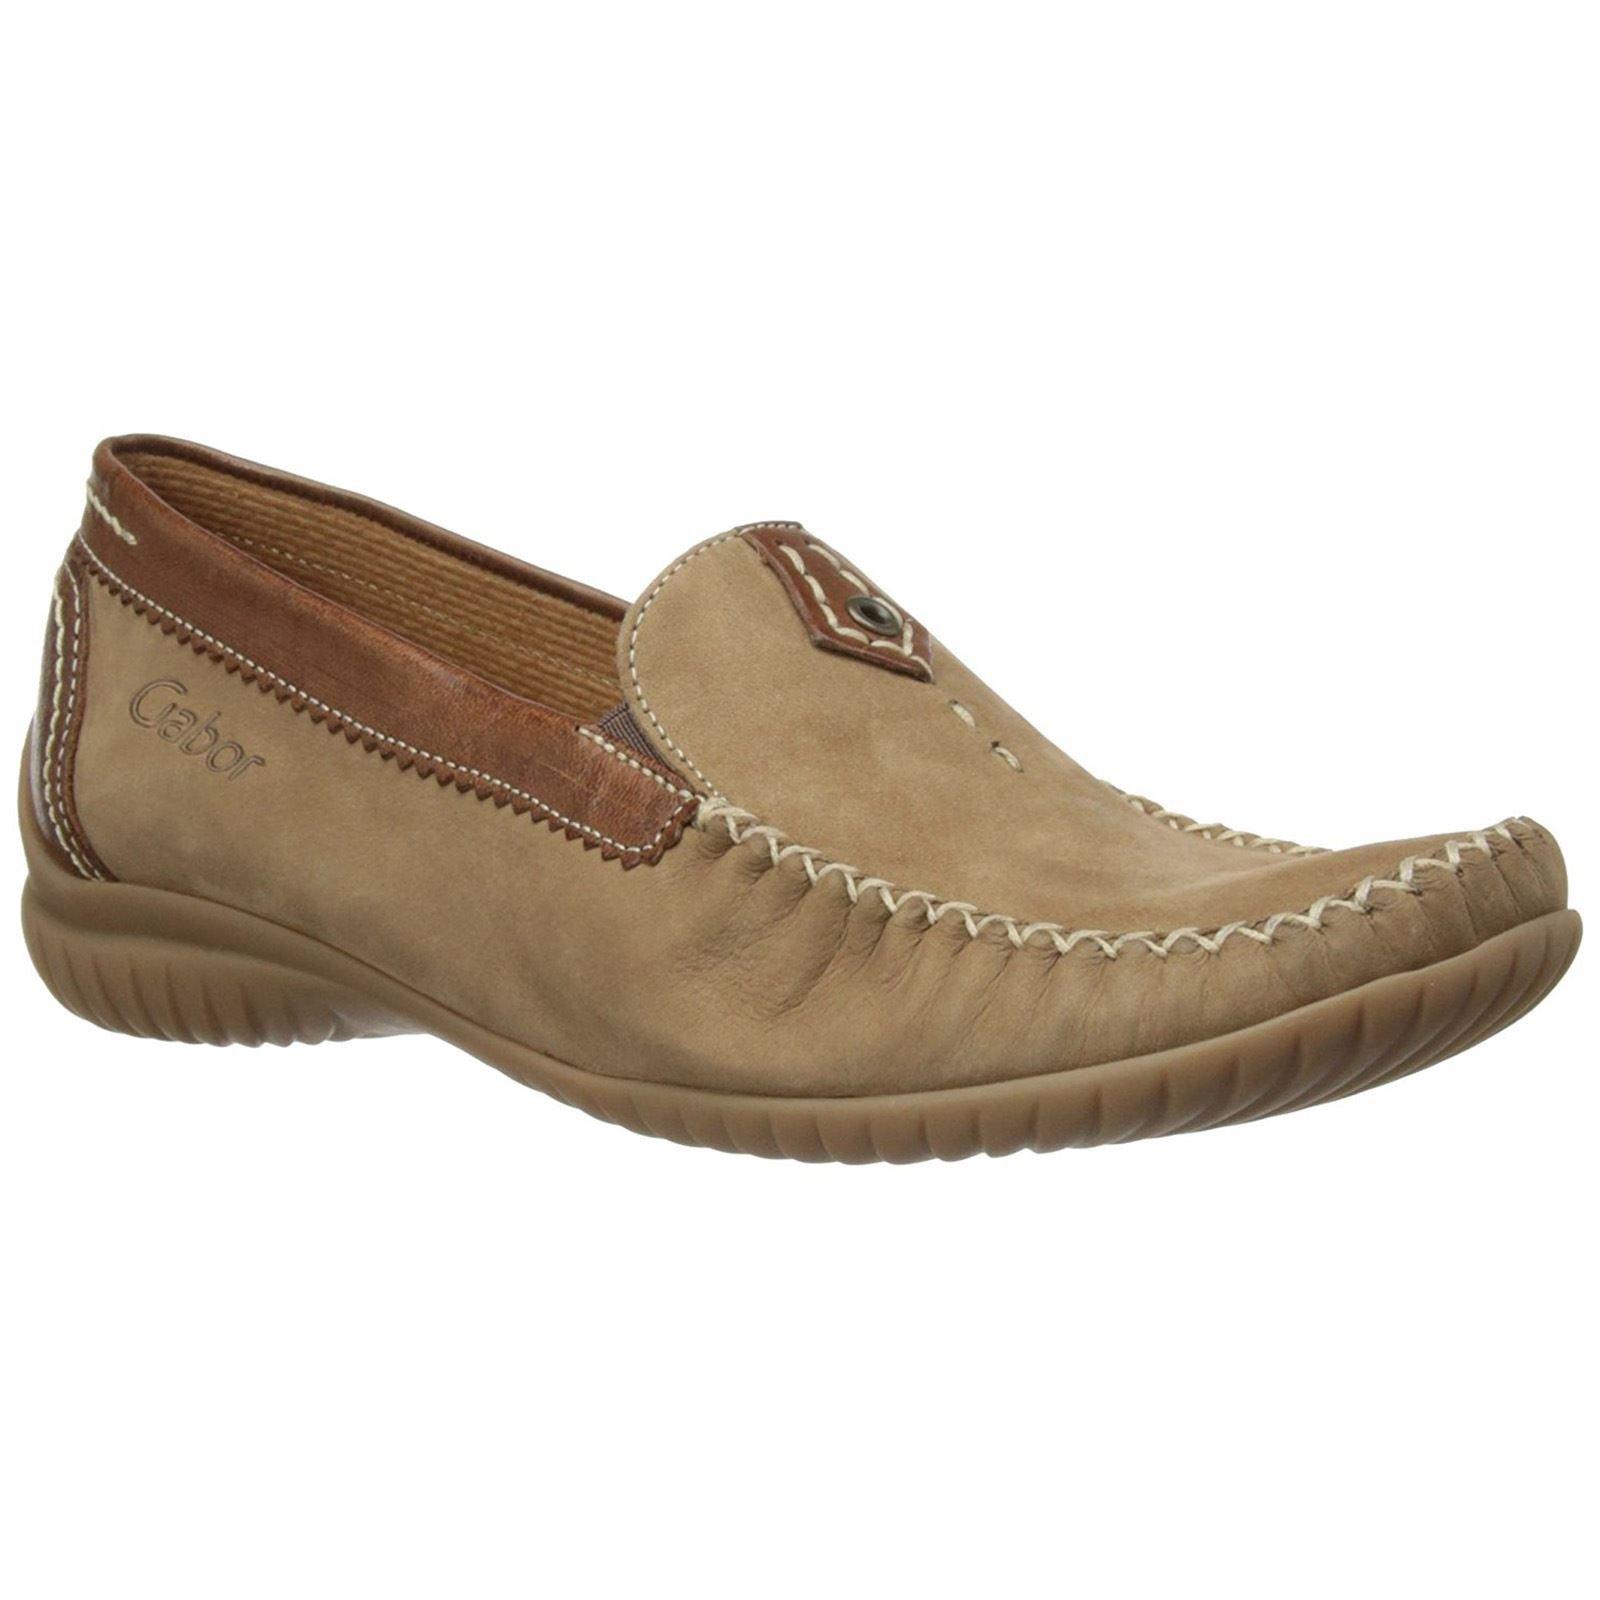 Gabor Womens California 86.090.43 Corda Copper Nubuck Shoes 8.5 US